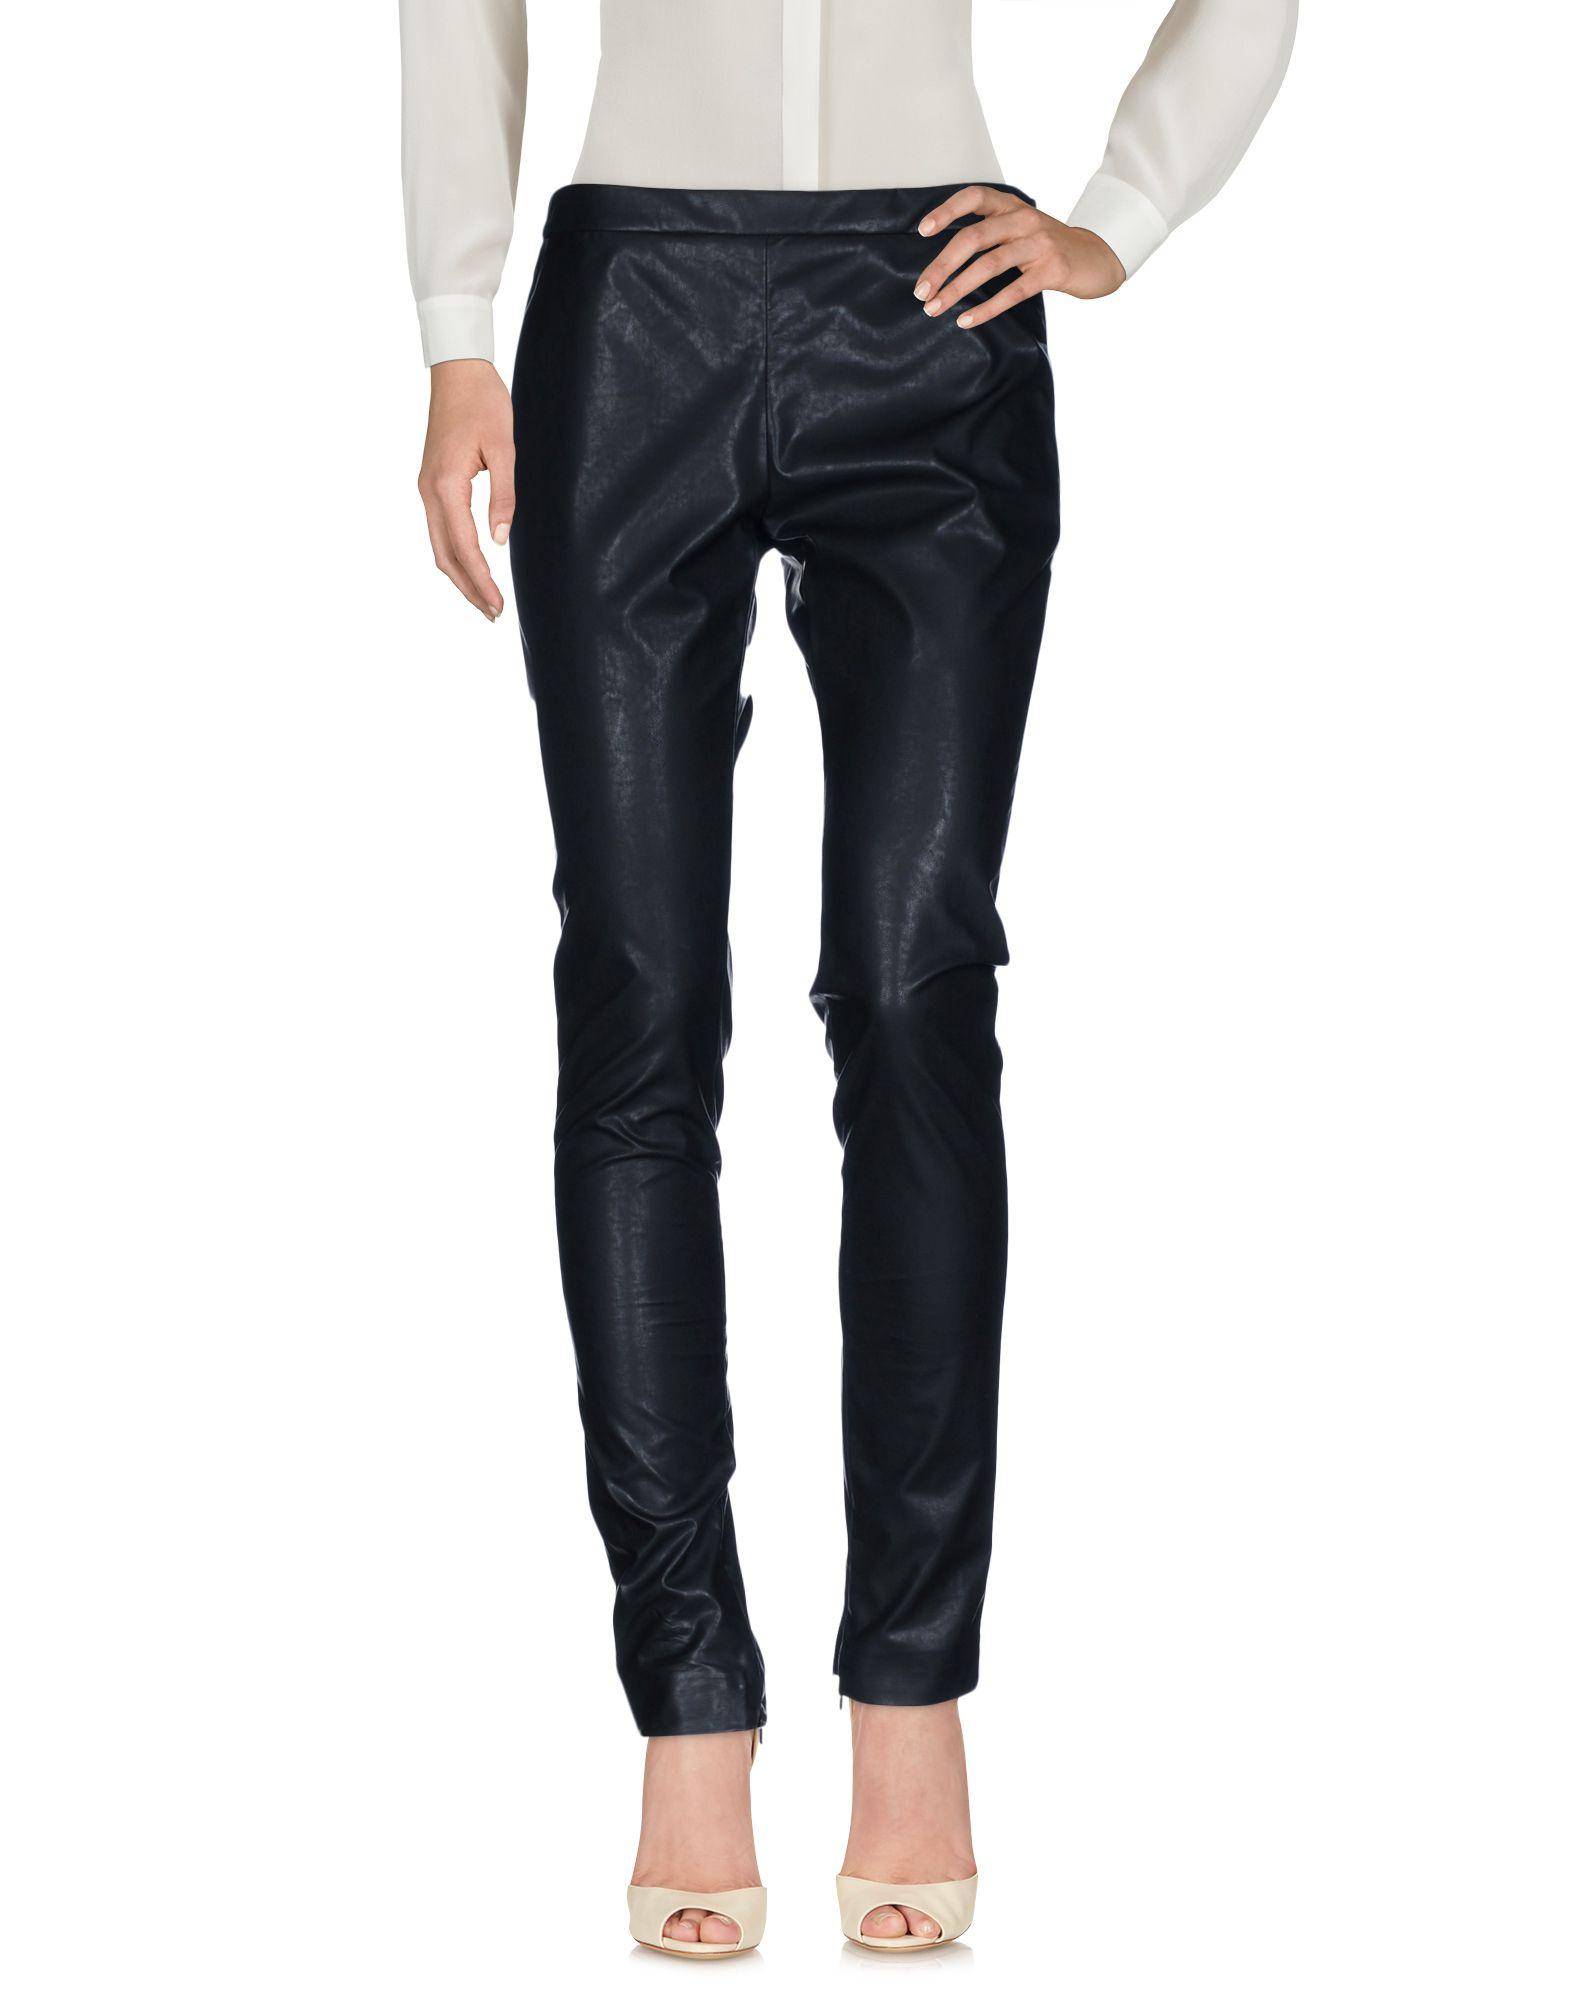 Pantalone Msgm donna donna donna - 13108400PJ 4d9